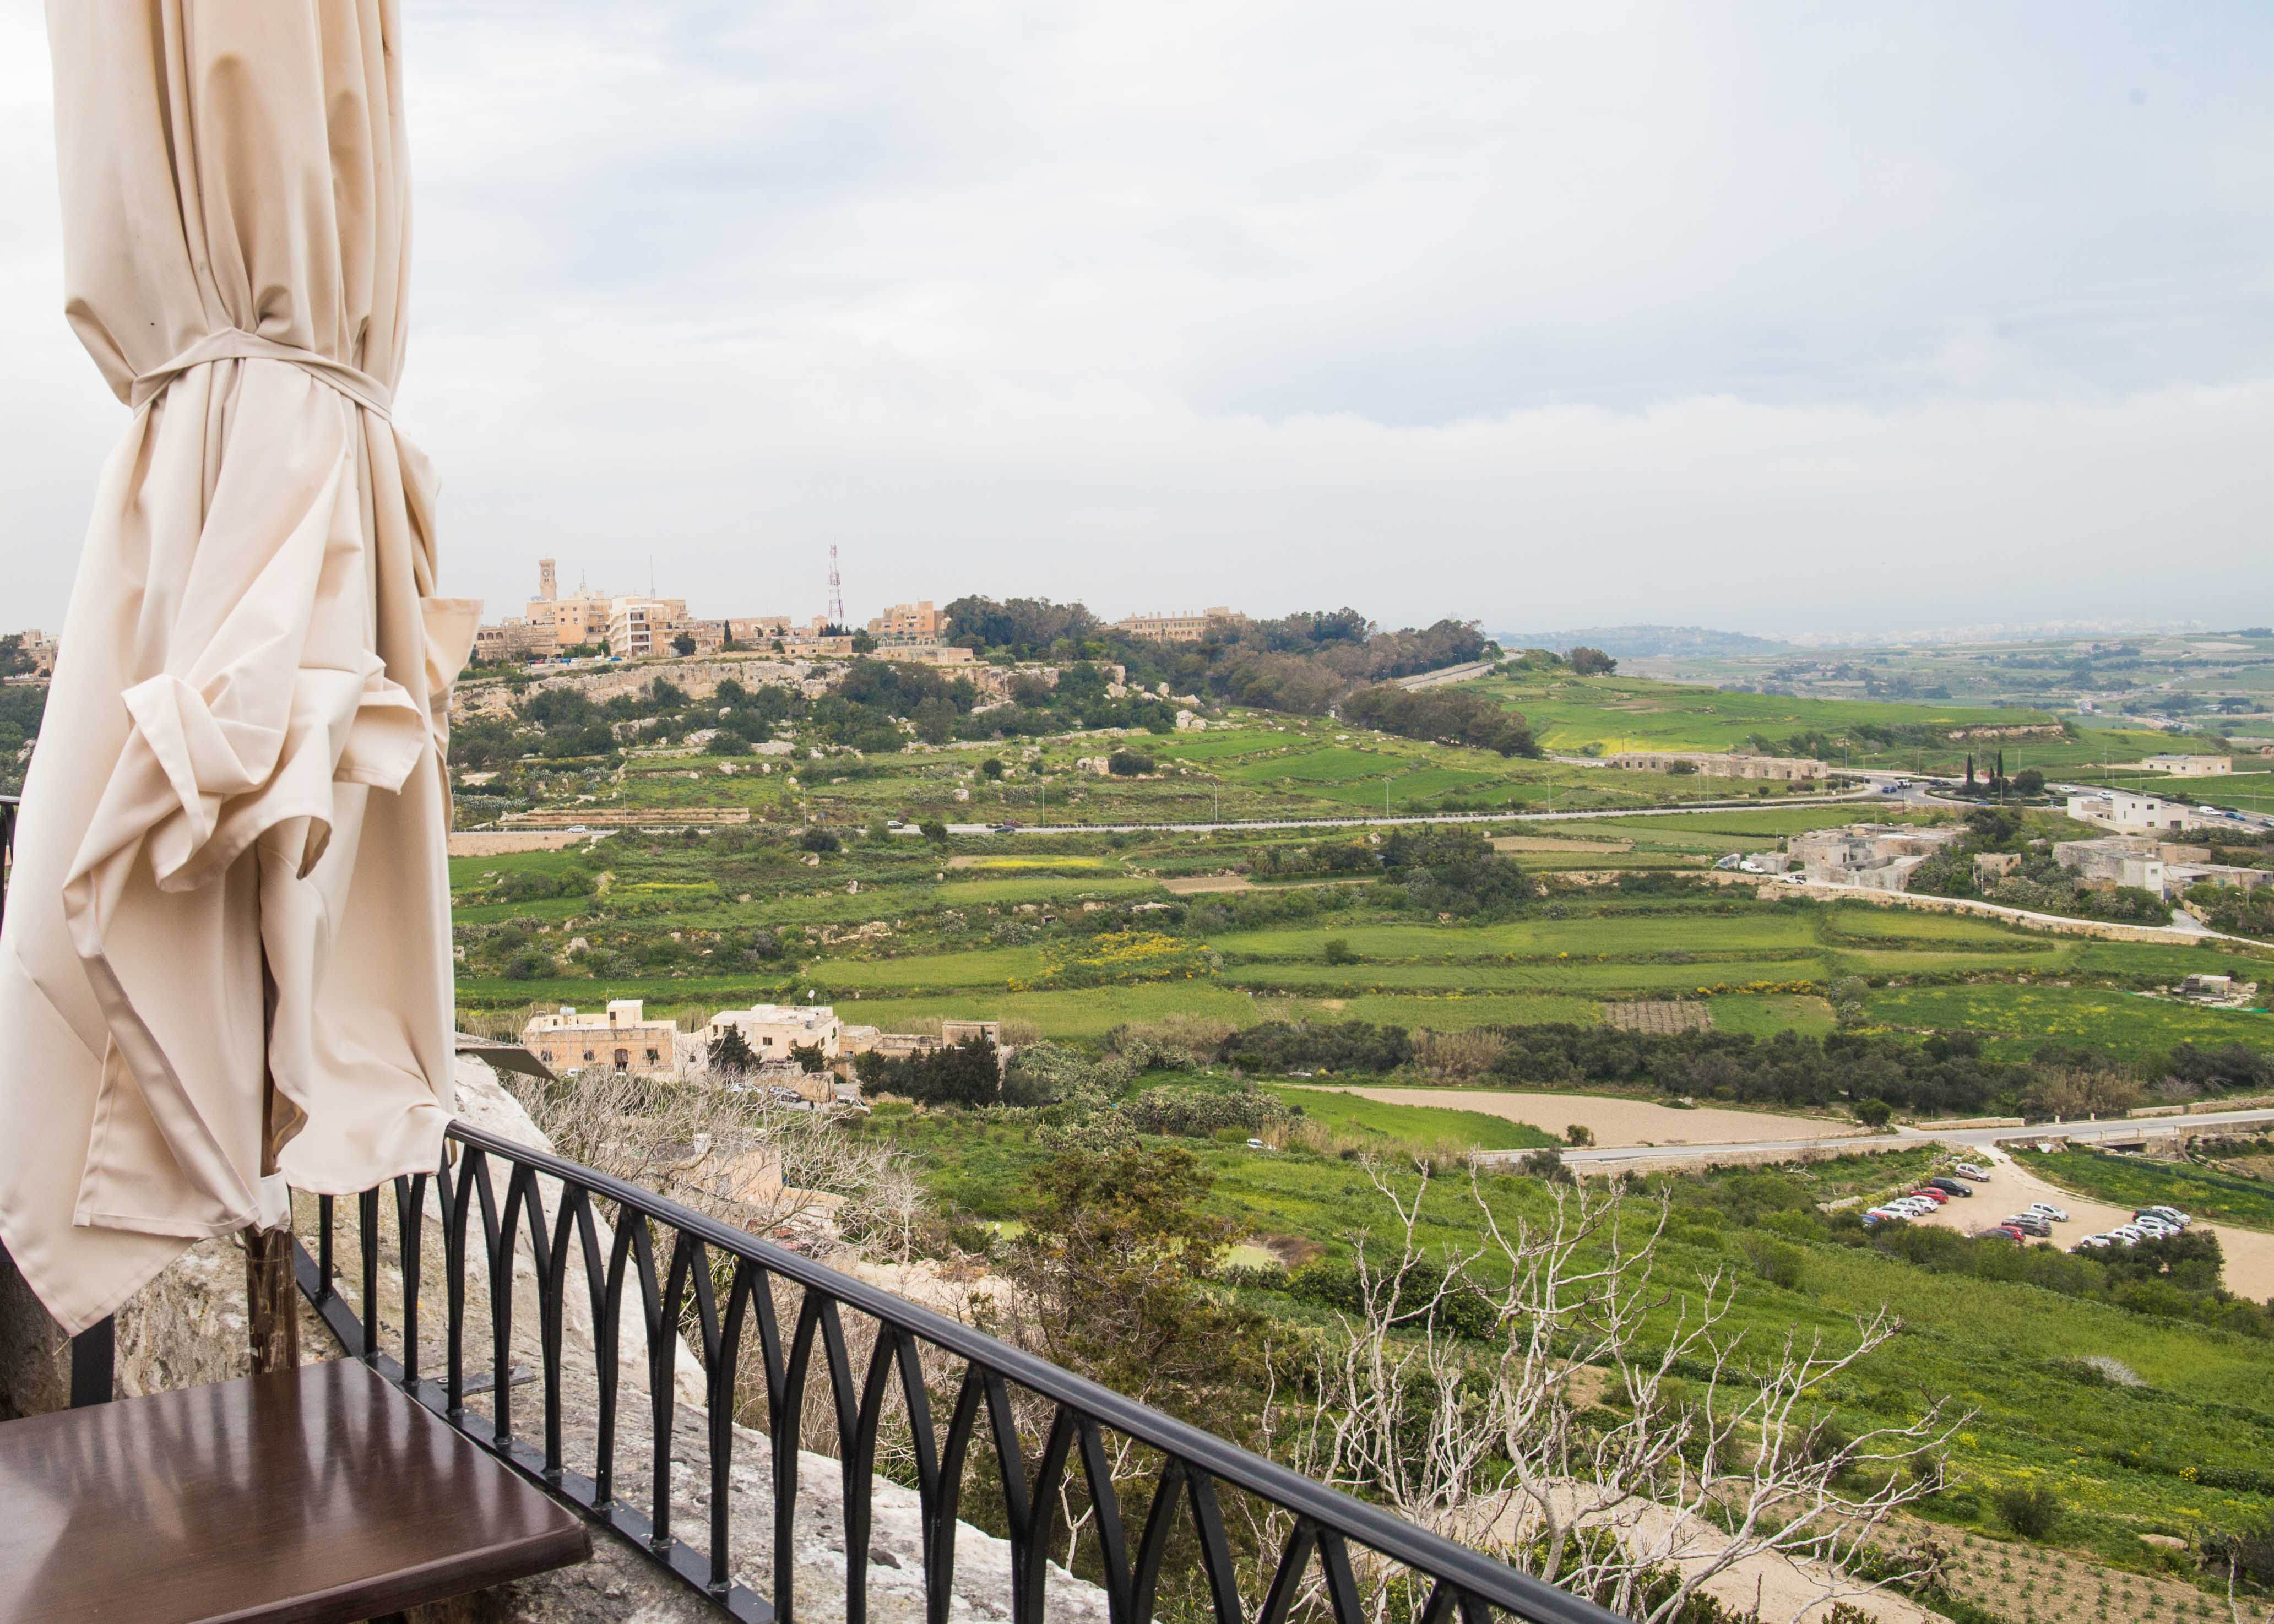 Best cafe in Mdina, Mdina Gate, Malta